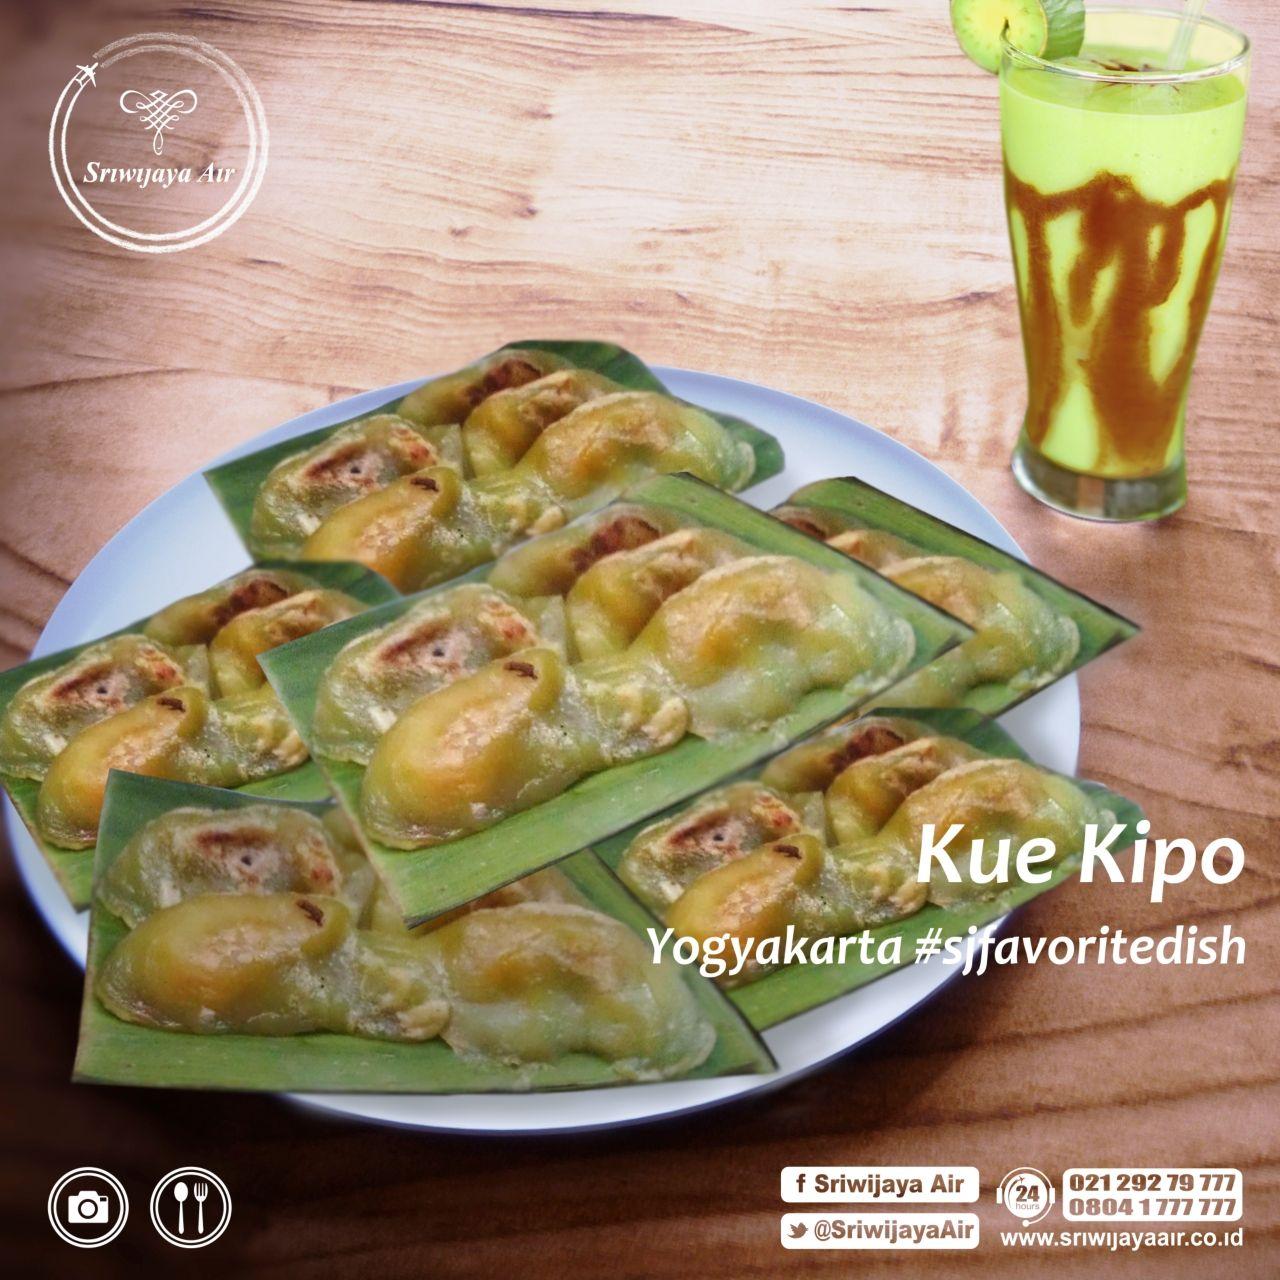 Kue Kipo Adalah Jajanan Khas Kotegede Rasanya Manis Dan Bentuknya Mungil Hanya Sekali Lahap Saja Partners Kue Ini Berwarna Hij Makanan Makanan Indonesia Kue